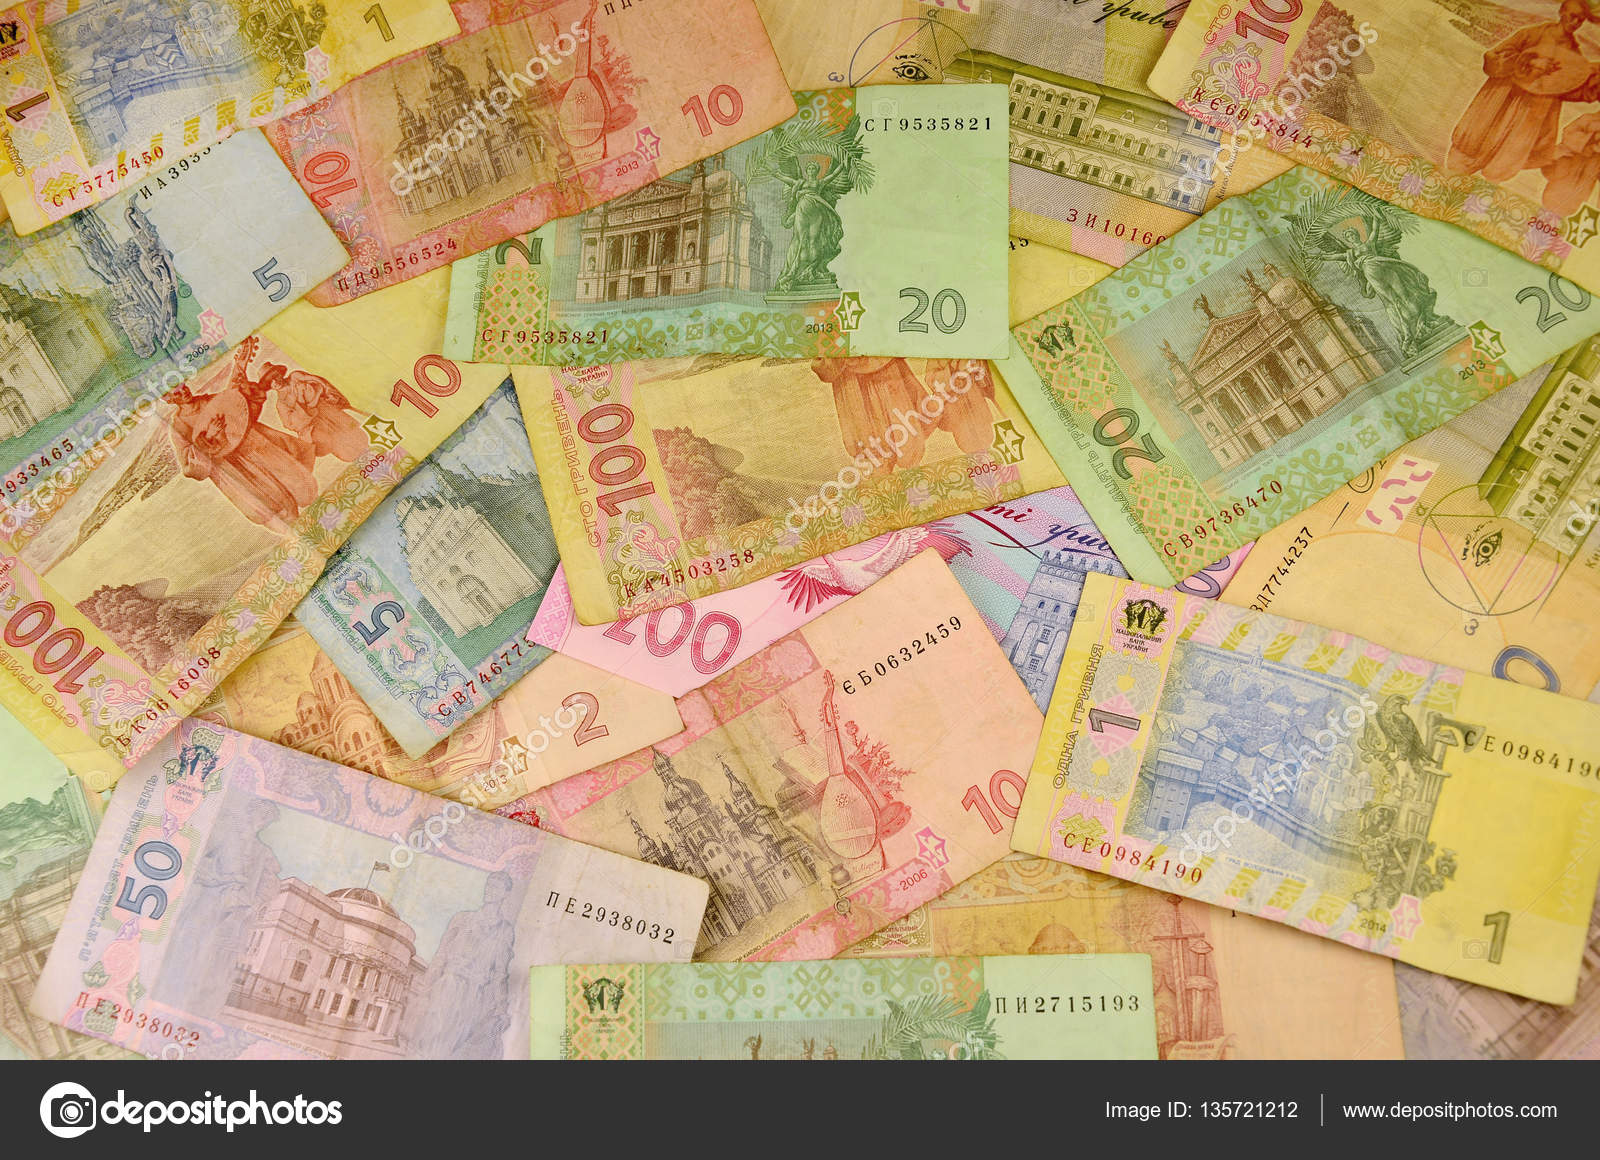 UAH - bu para nedir Ukraynanın ulusal para birimi